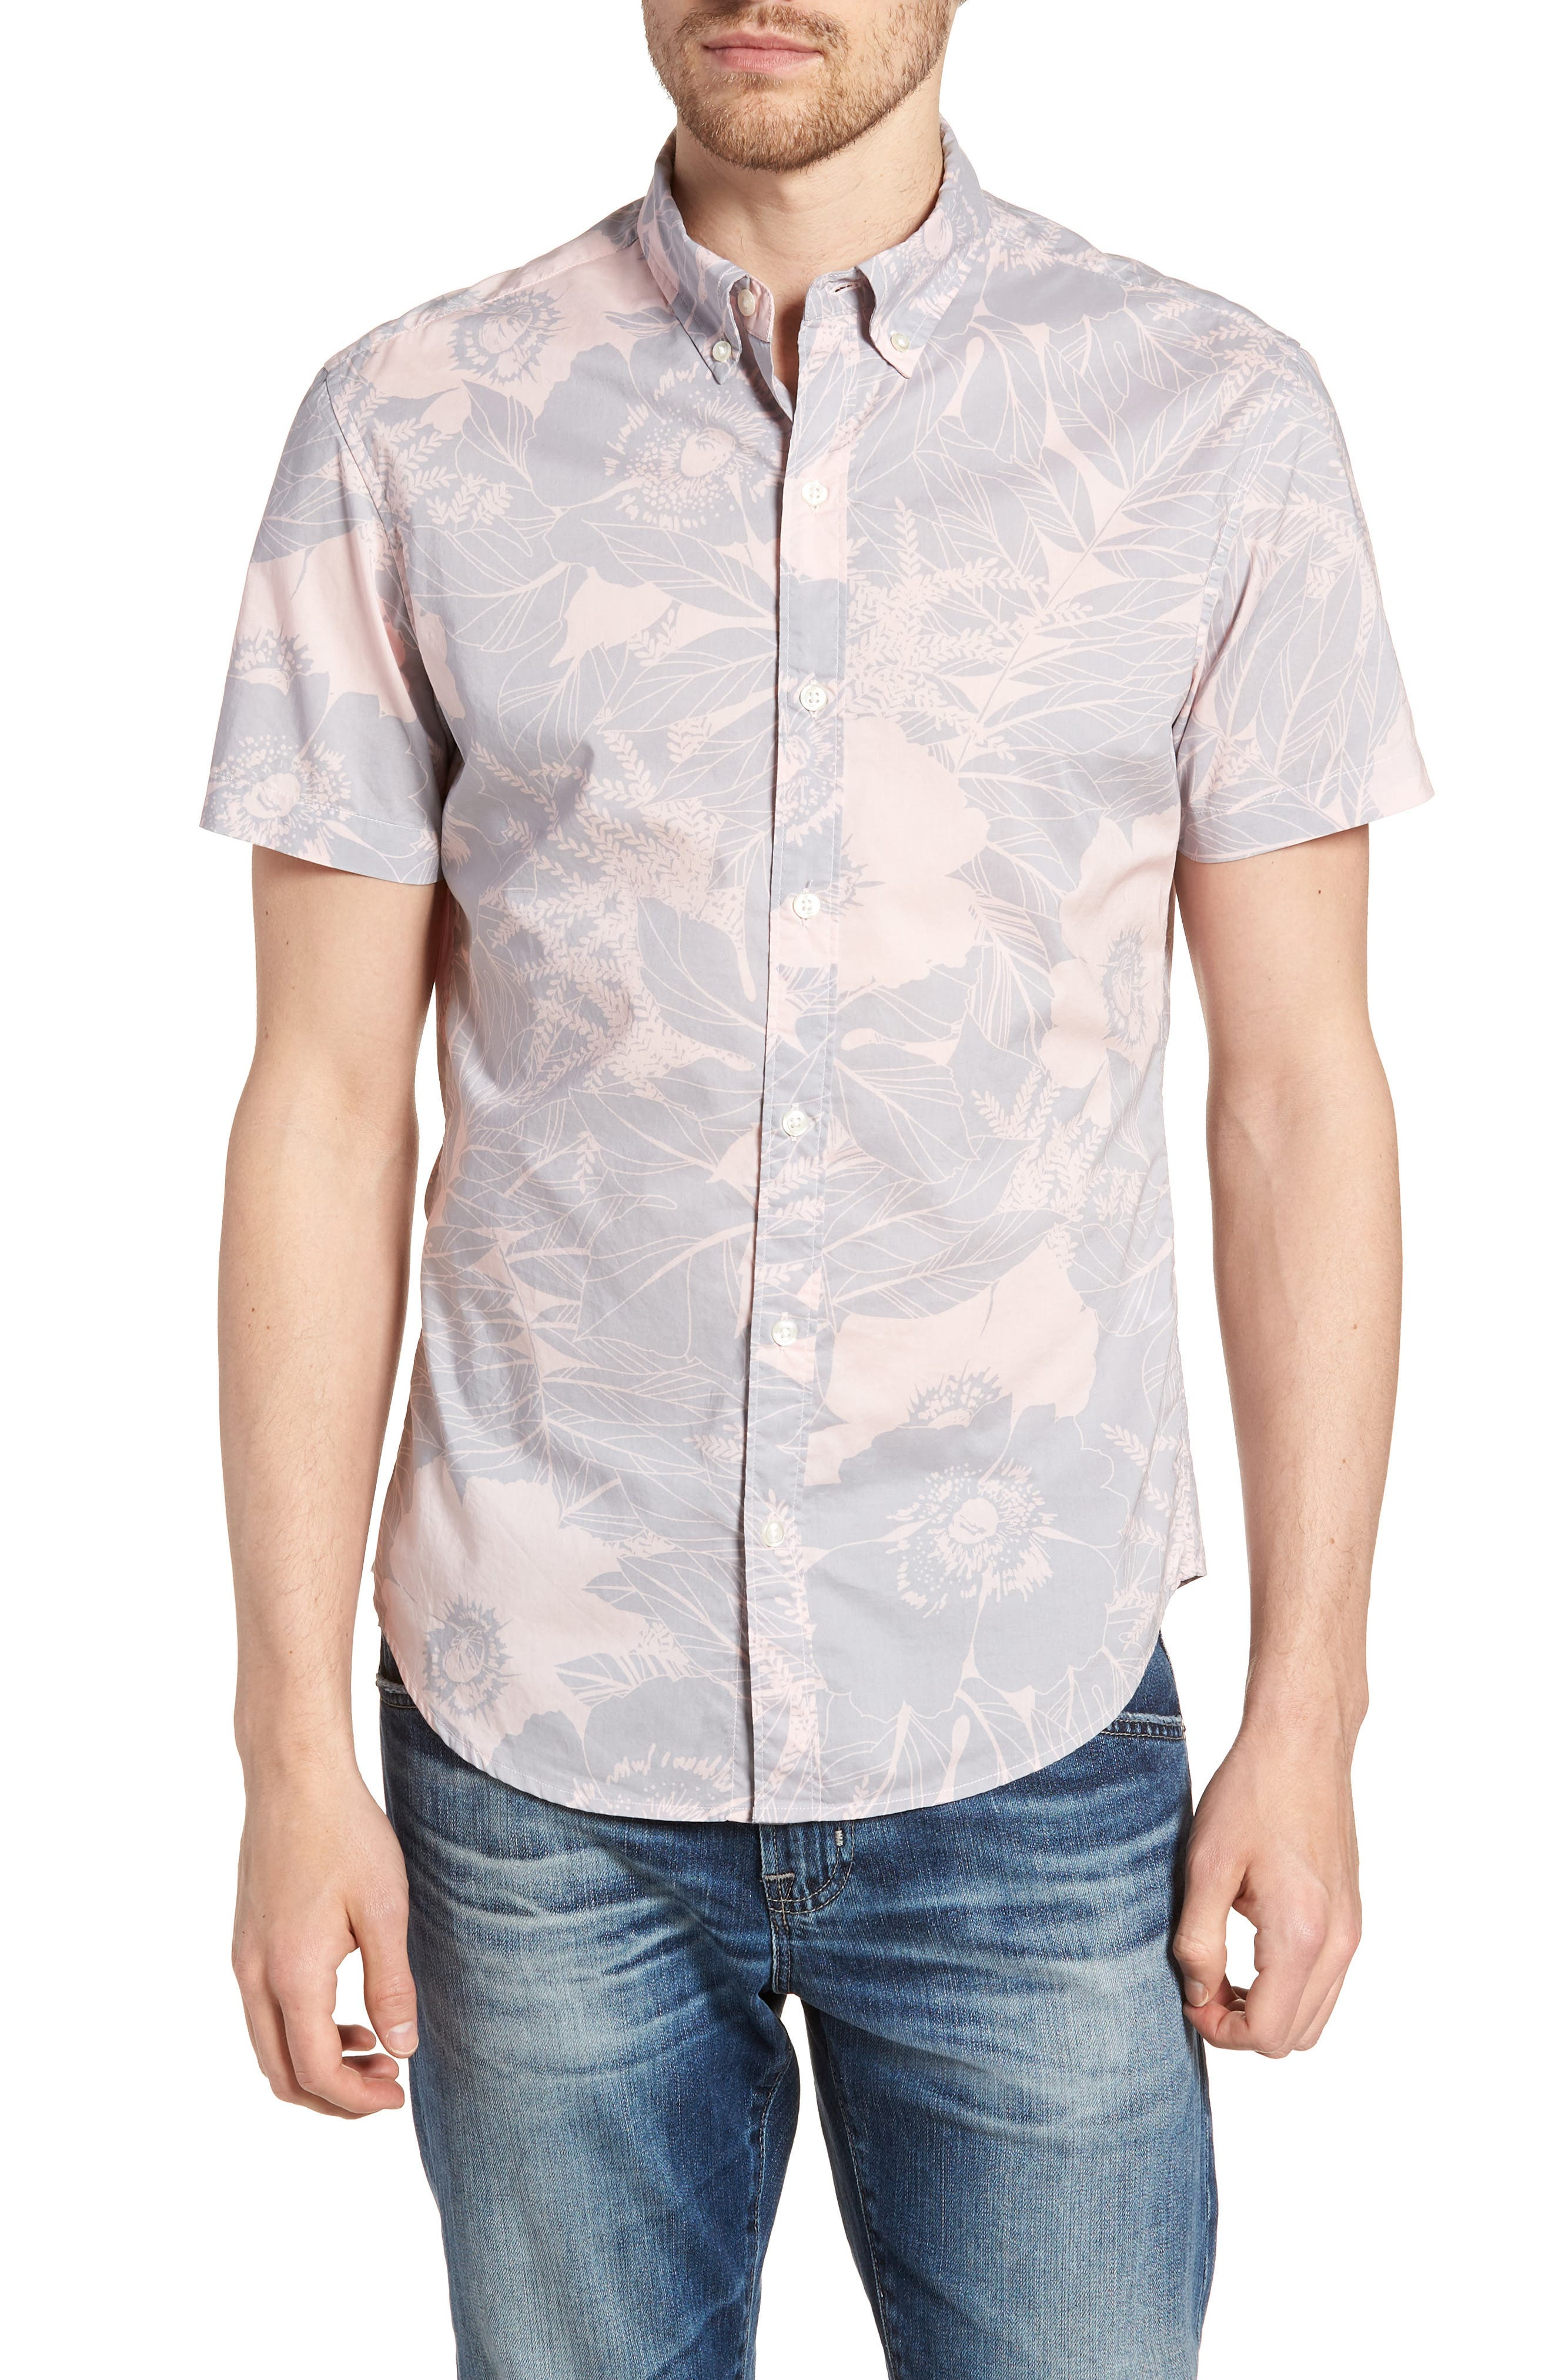 Riviera Slim Fit Floral Print Sport Shirt,                             Main thumbnail 1, color,                             LINEAR FLORAL - SKIVVY PINK